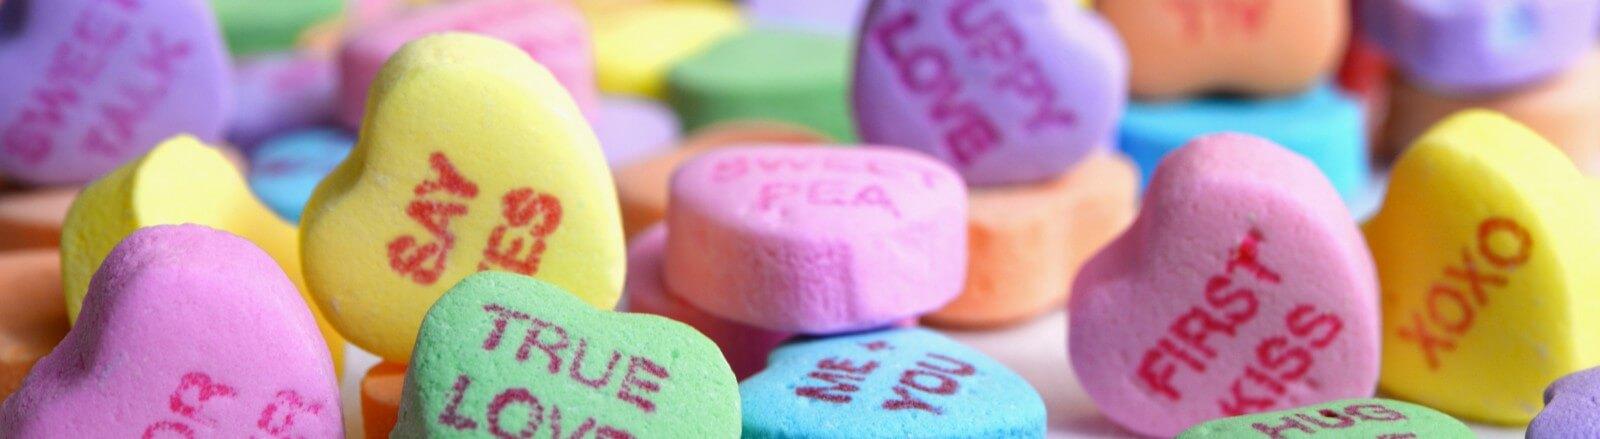 7 unconventional Valentine's Day gift ideas